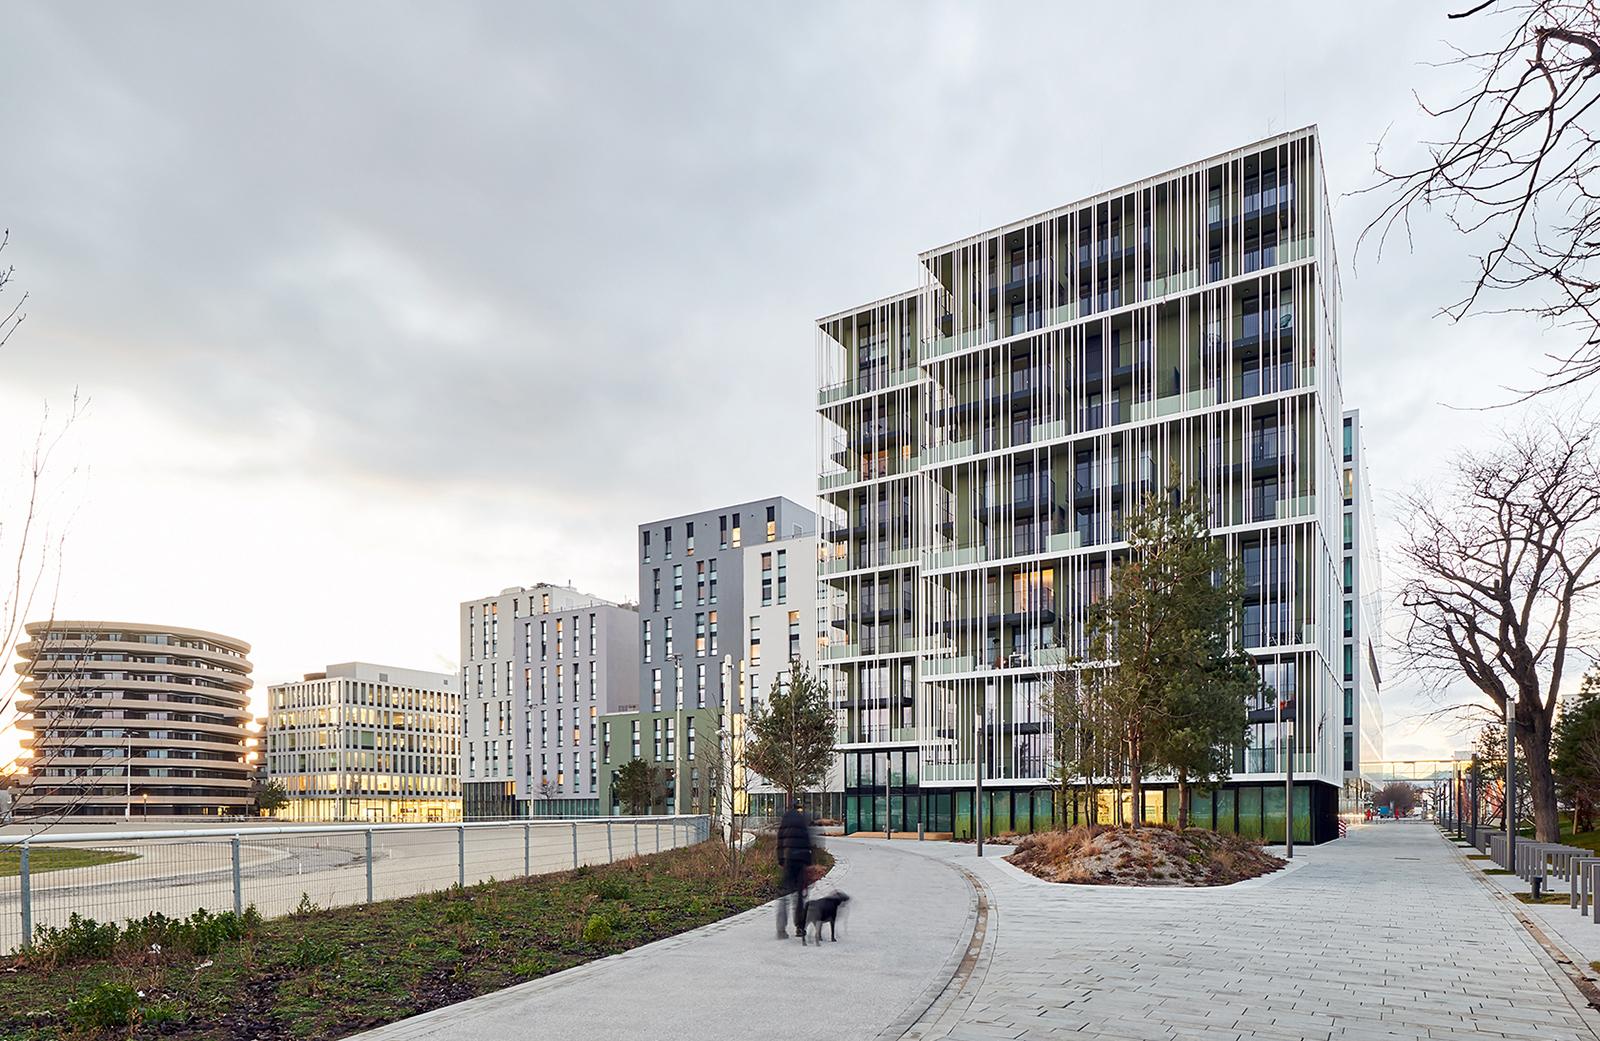 Chaix & Morel et associes | CAP Architekten